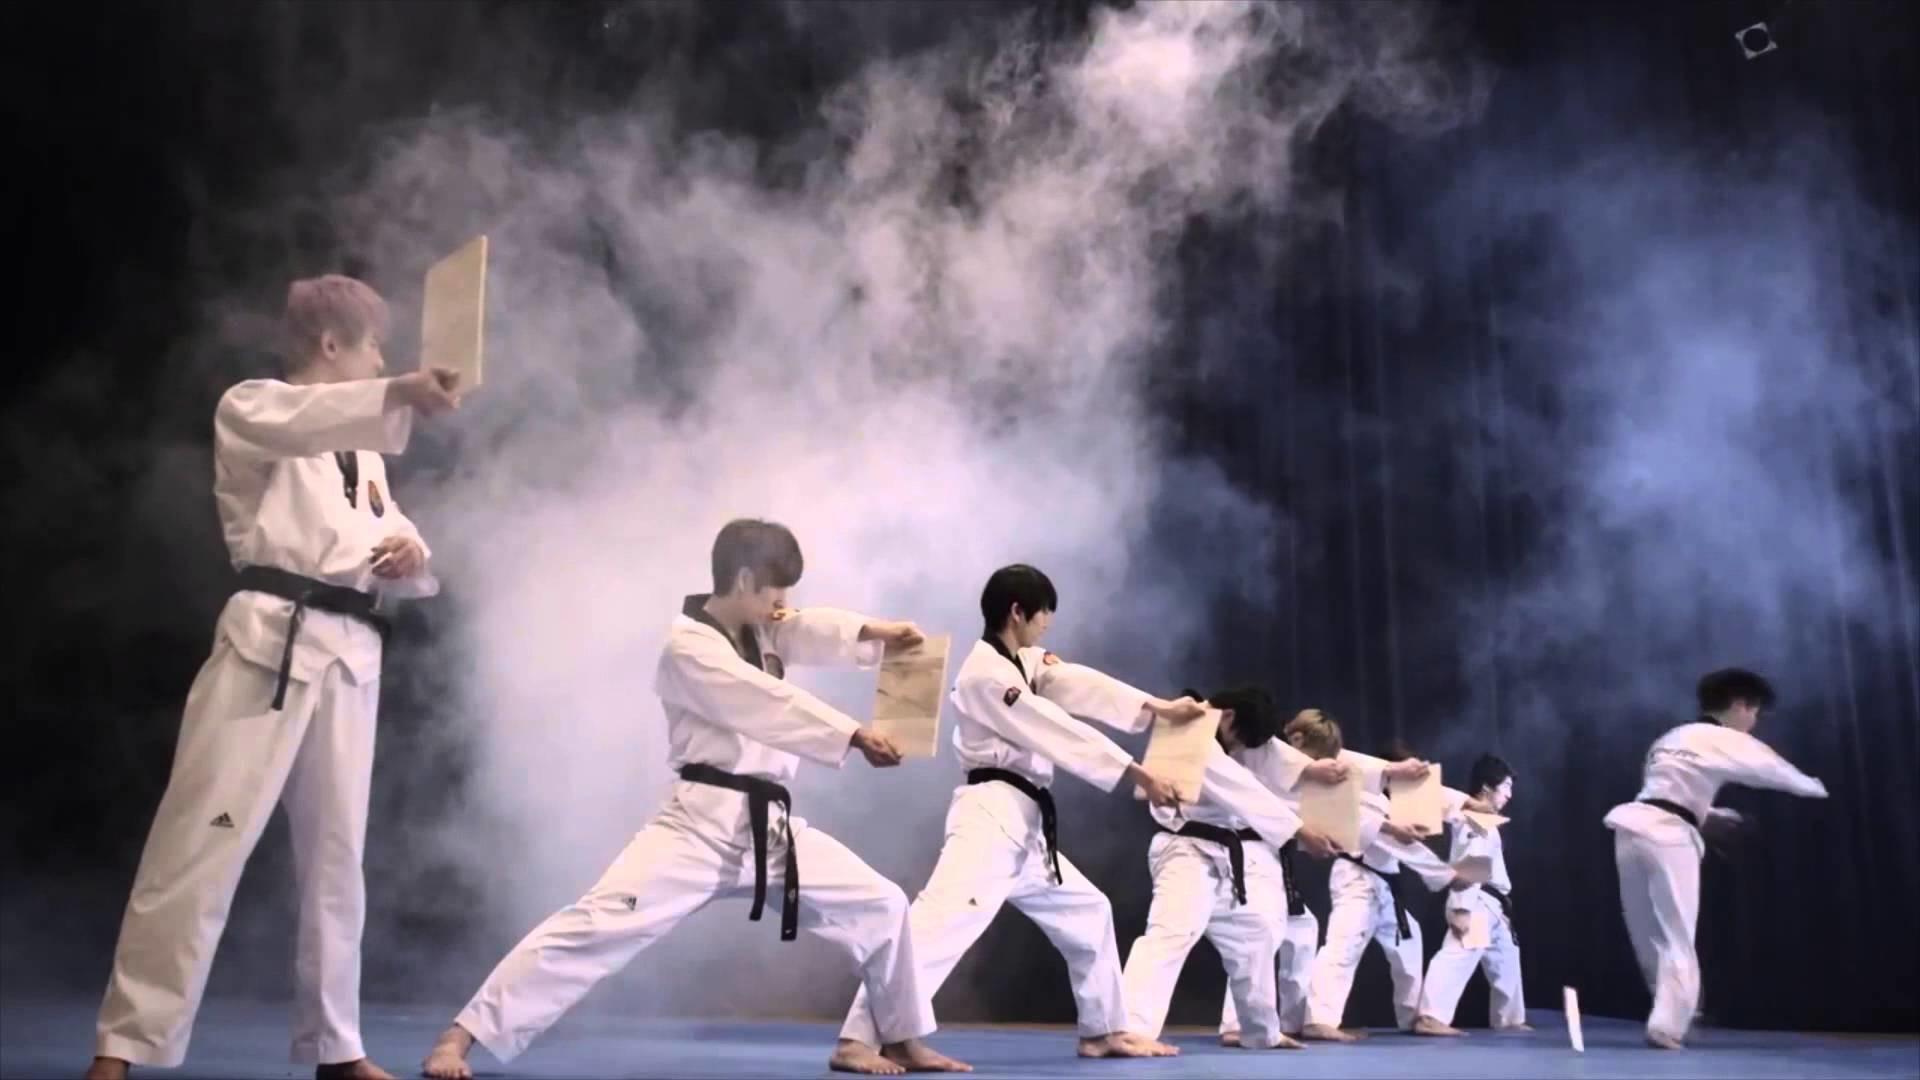 Taekwondo Wallpapers (60+ images)